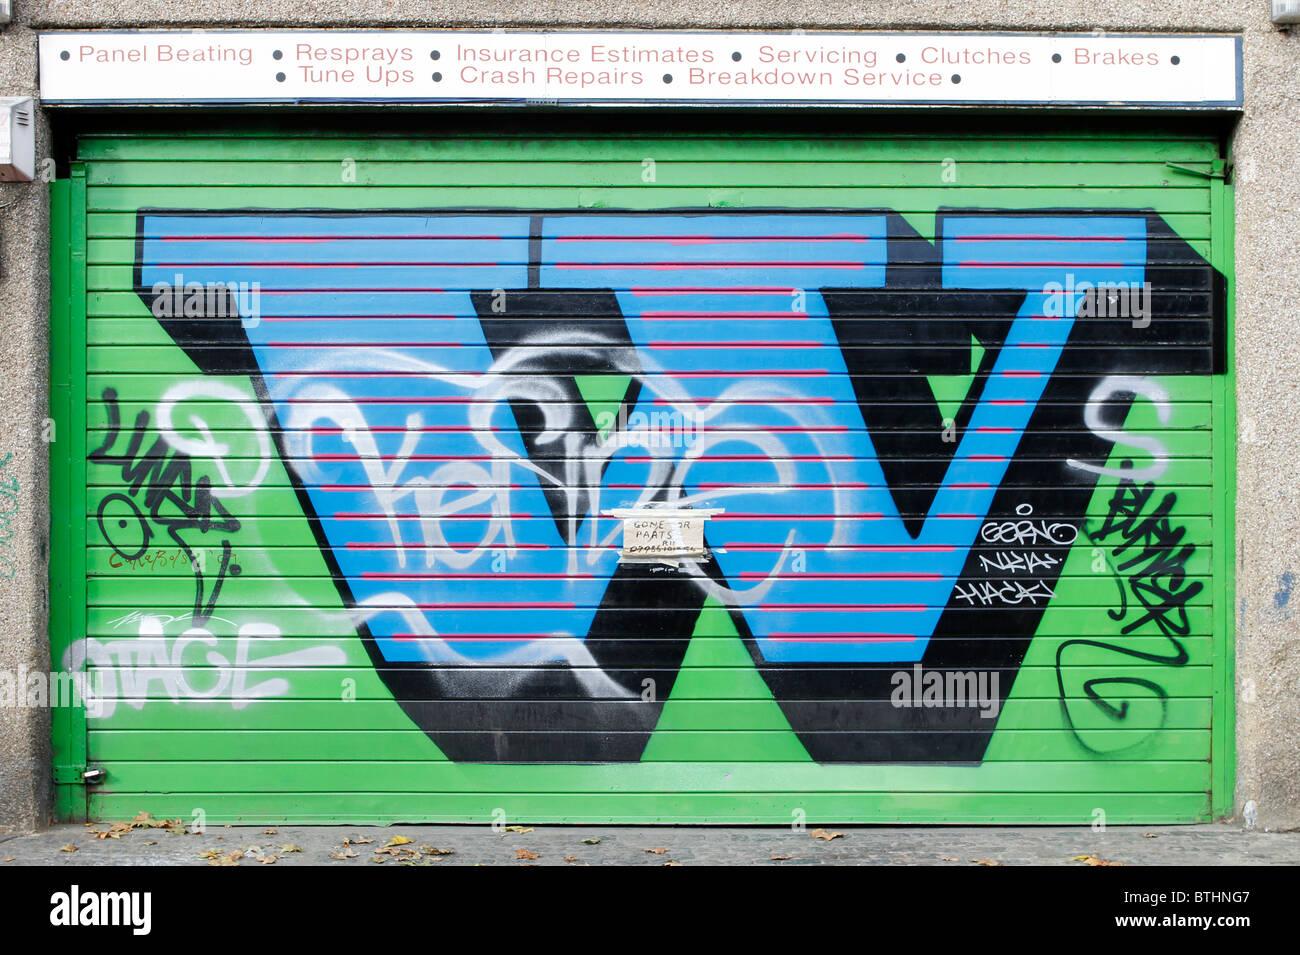 Eine letters graffiti on shutters, letter W, London Shoreditch, Street art, stencil contemporary urban trend - Stock Image